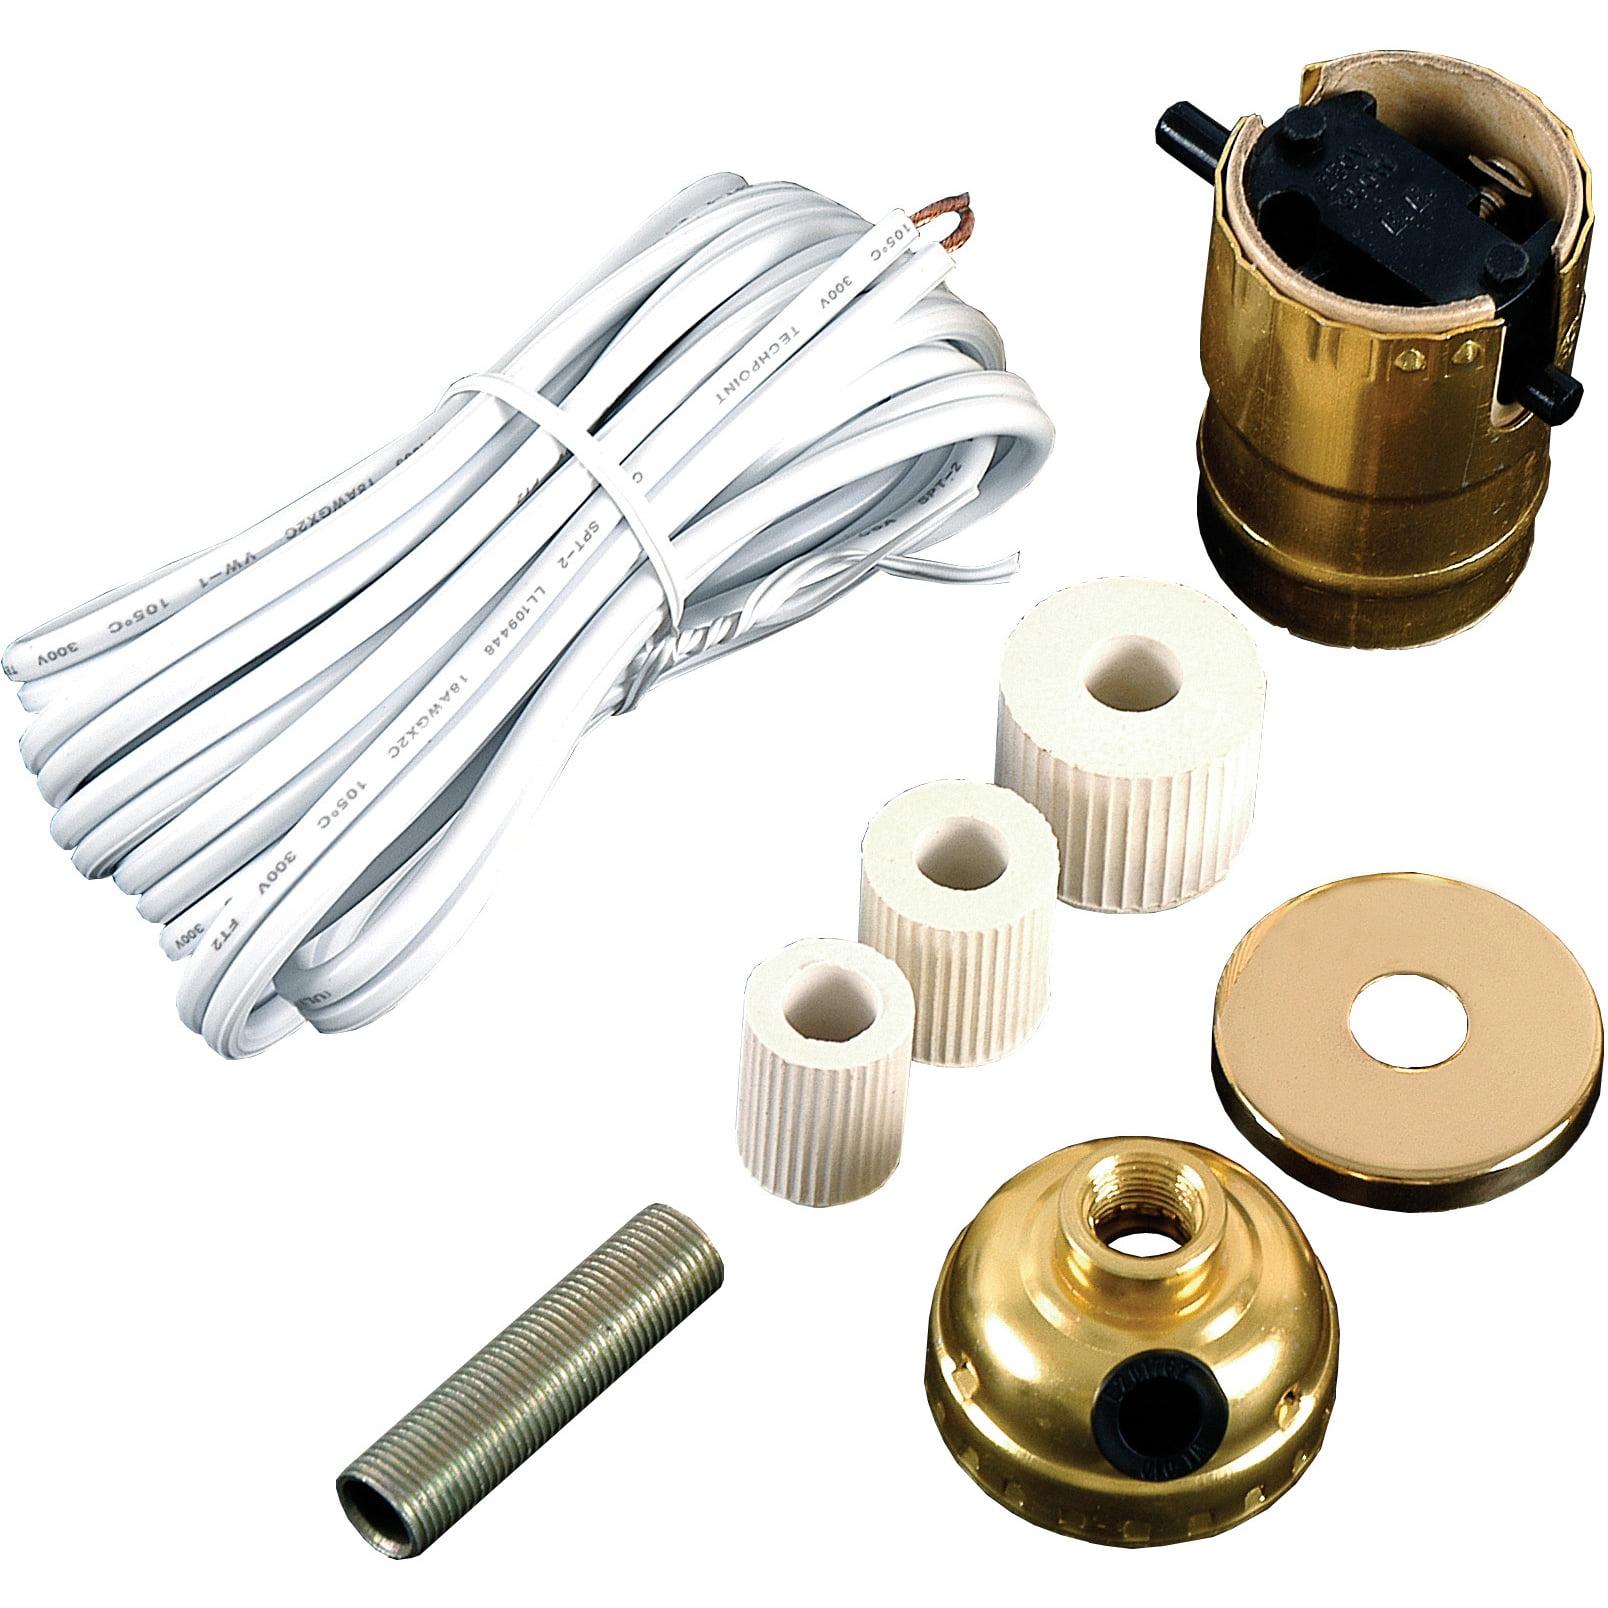 GE Bottle Lamp Kit, includes 8ft. Cord, Socket, Bottle Adapters, Fittings, 50961